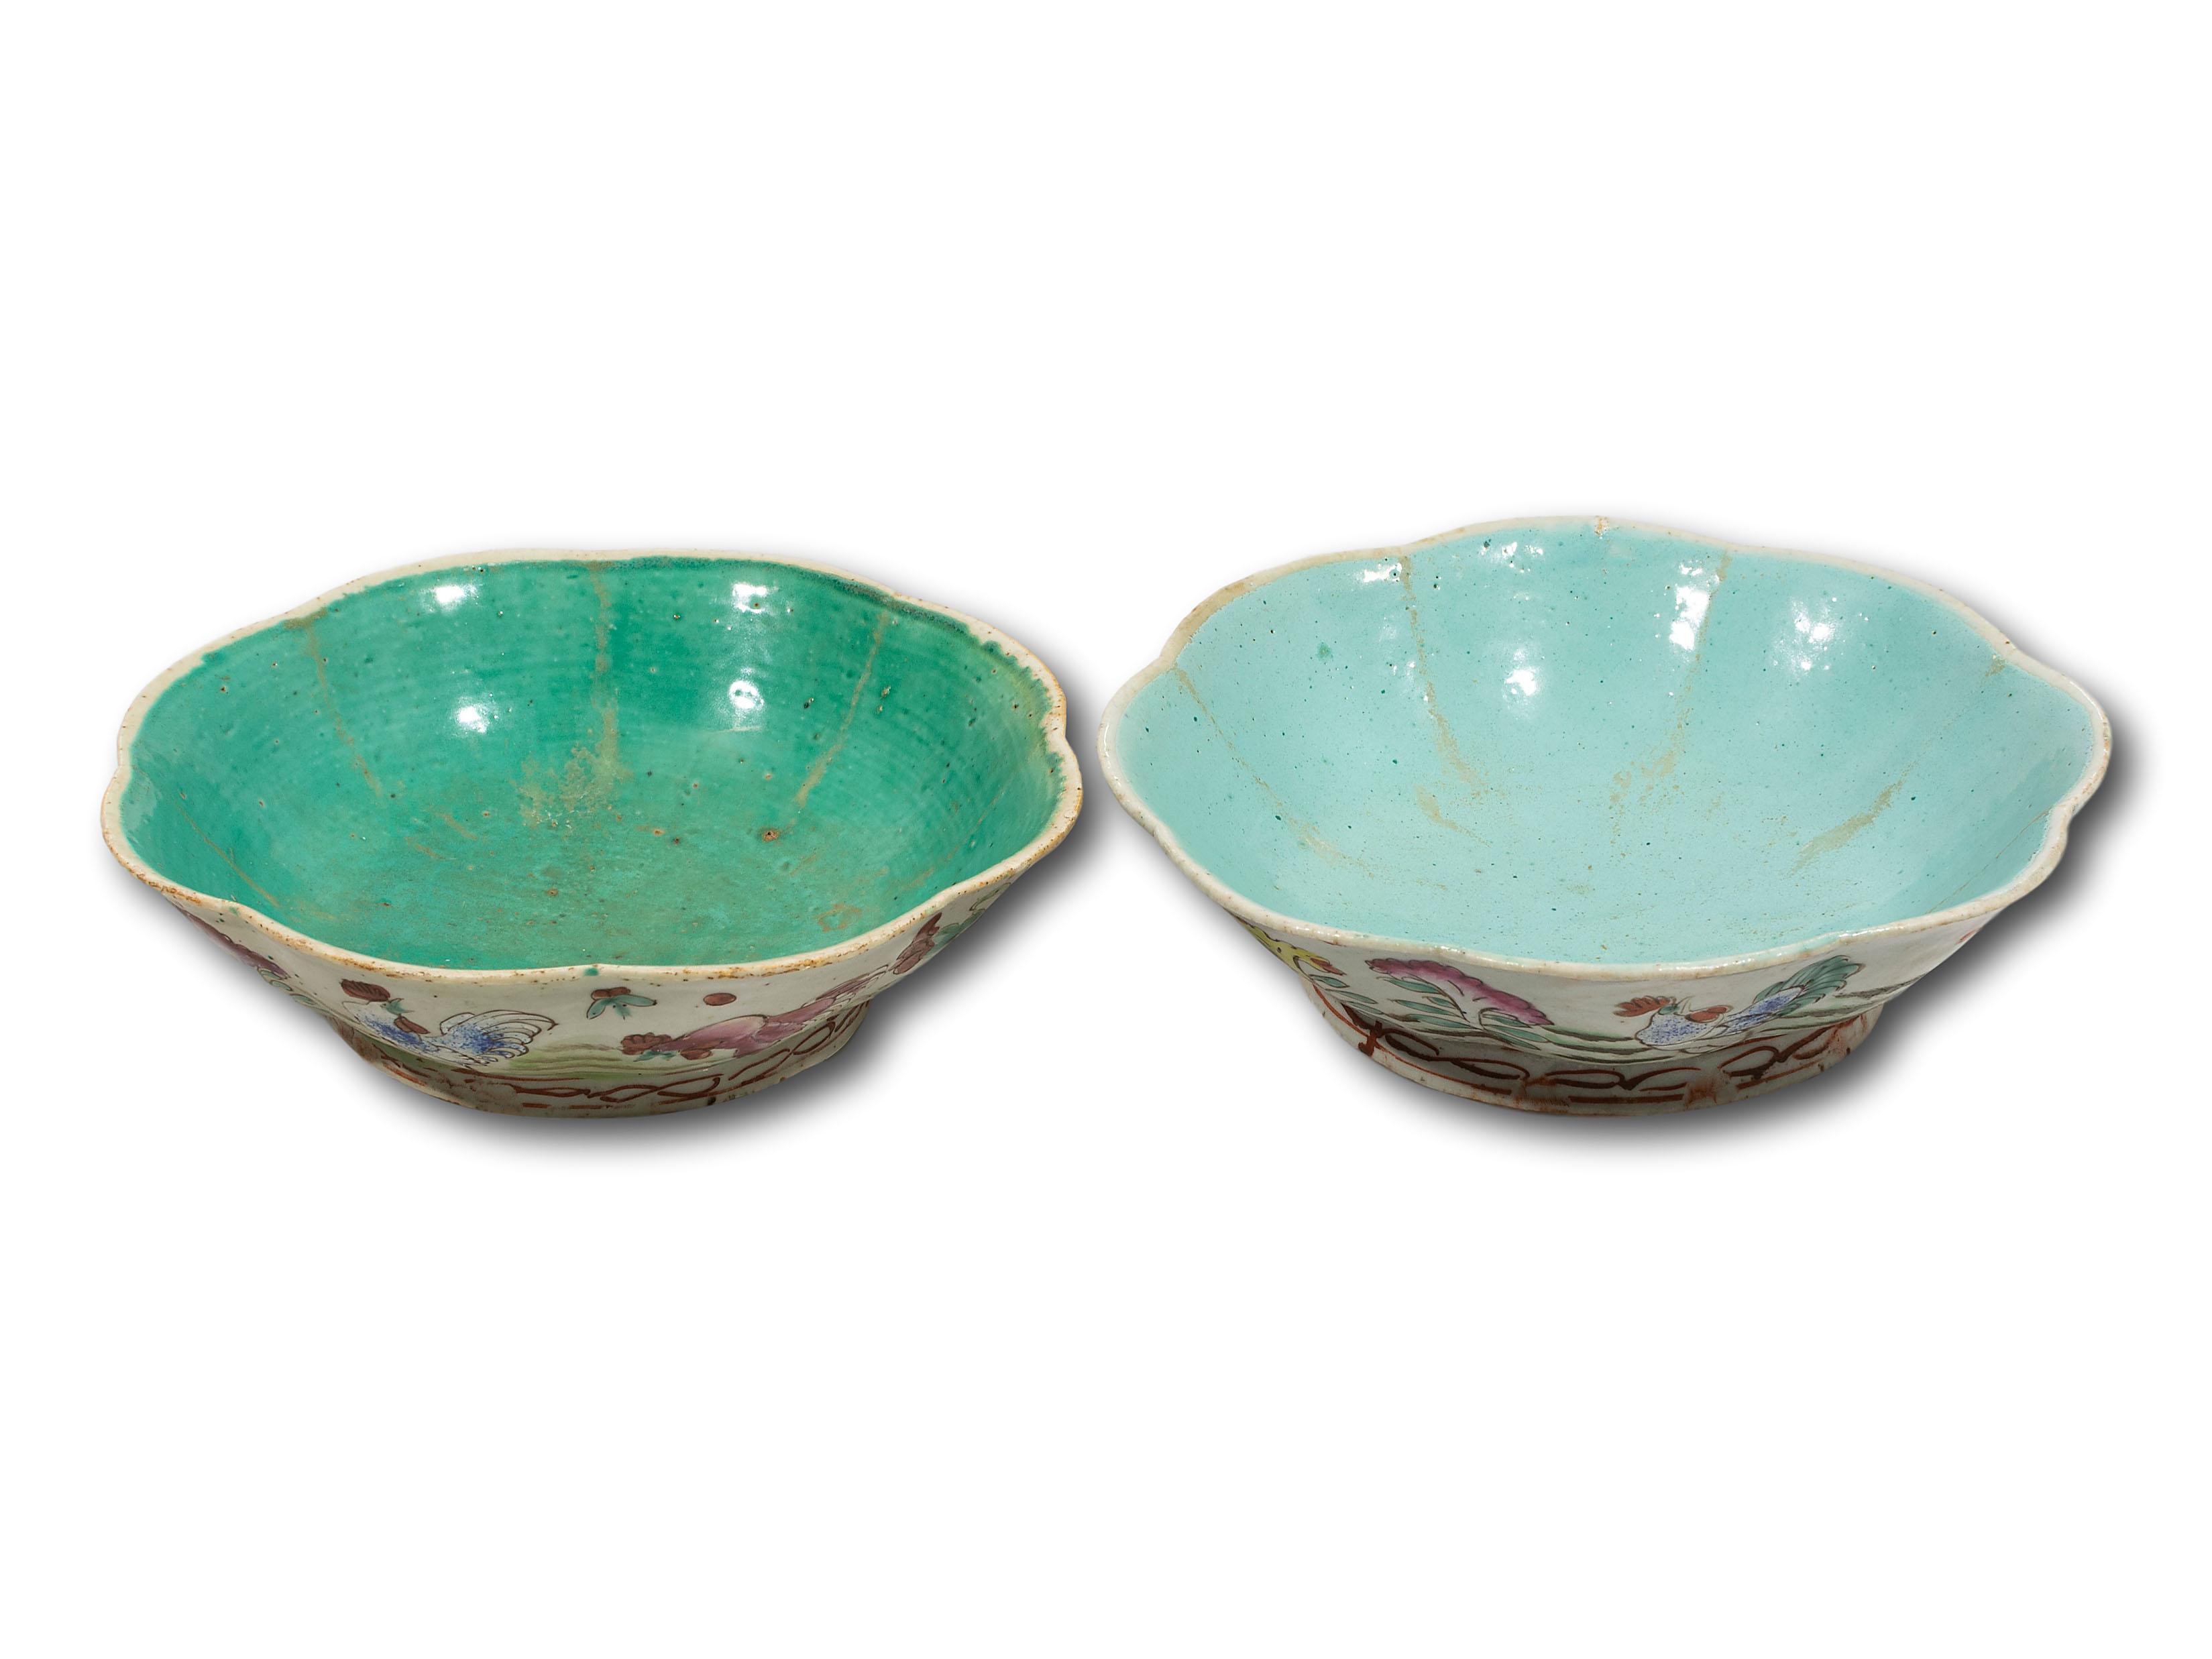 A Pair of Chinese Qianshou Hand Painted Bowls, 22cm diameter each